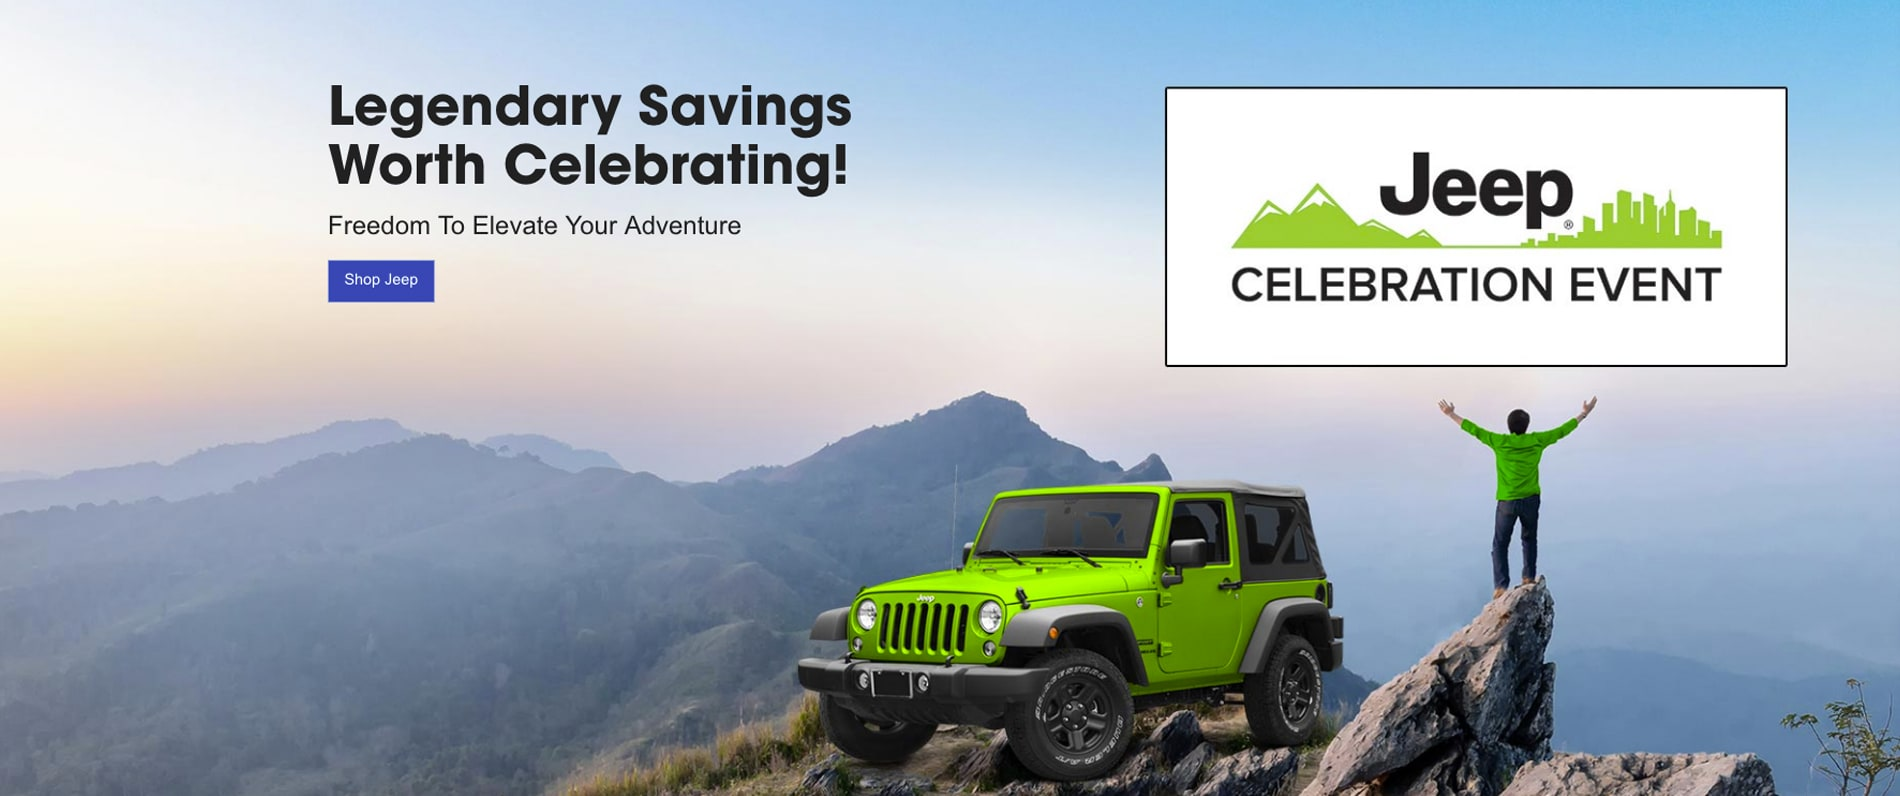 dealer sale grand chrysler for cherokee htm new nj jersey dealership jeep